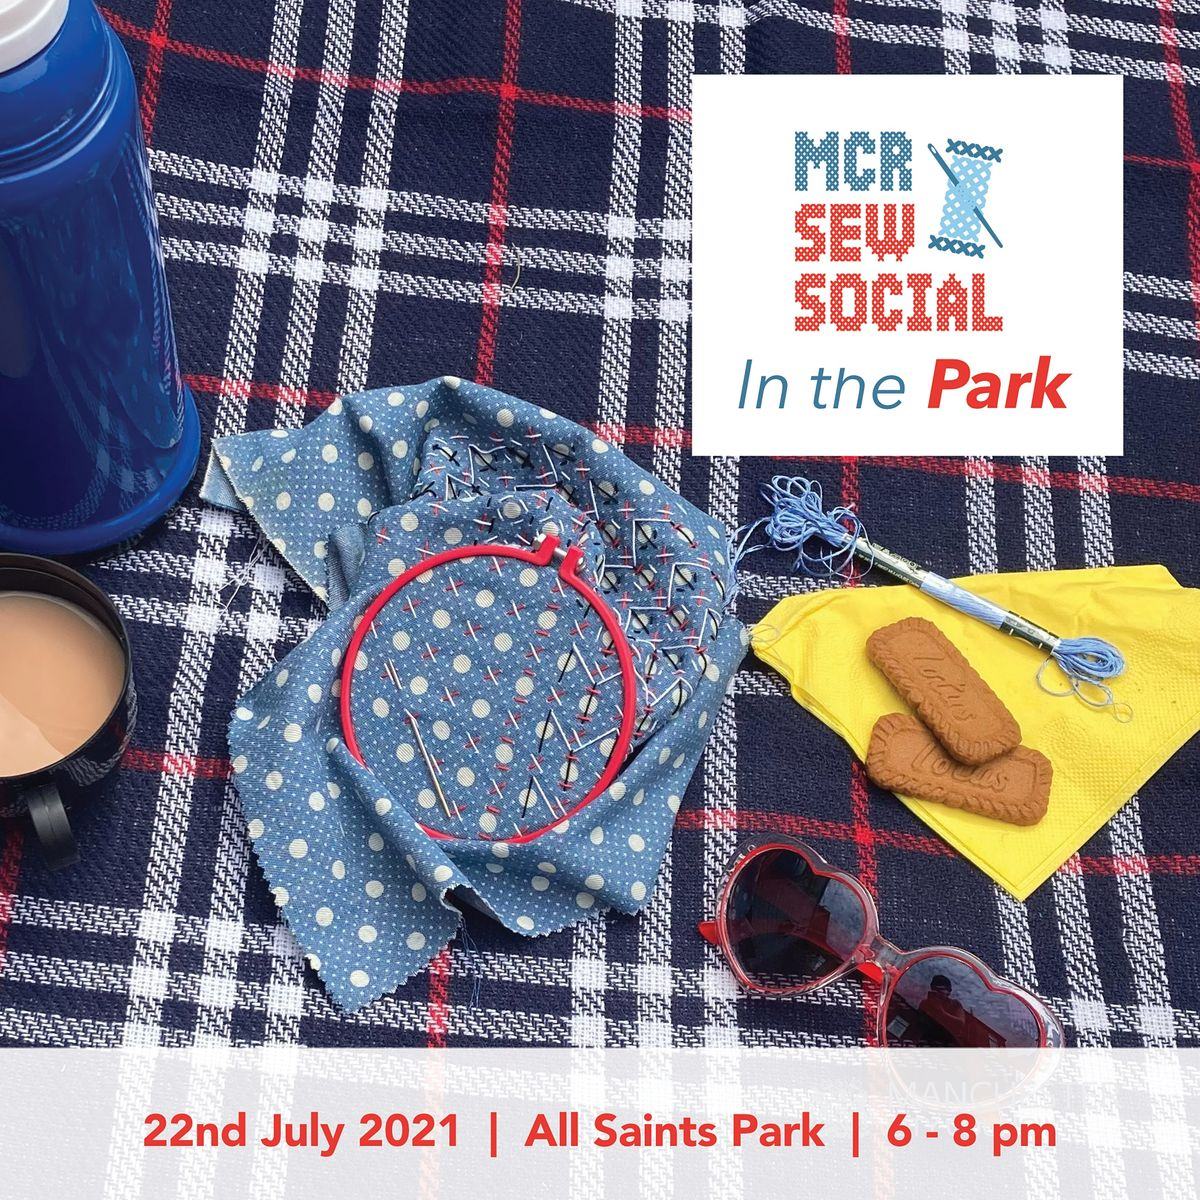 MCR Sew Social - Sew Social in the Park